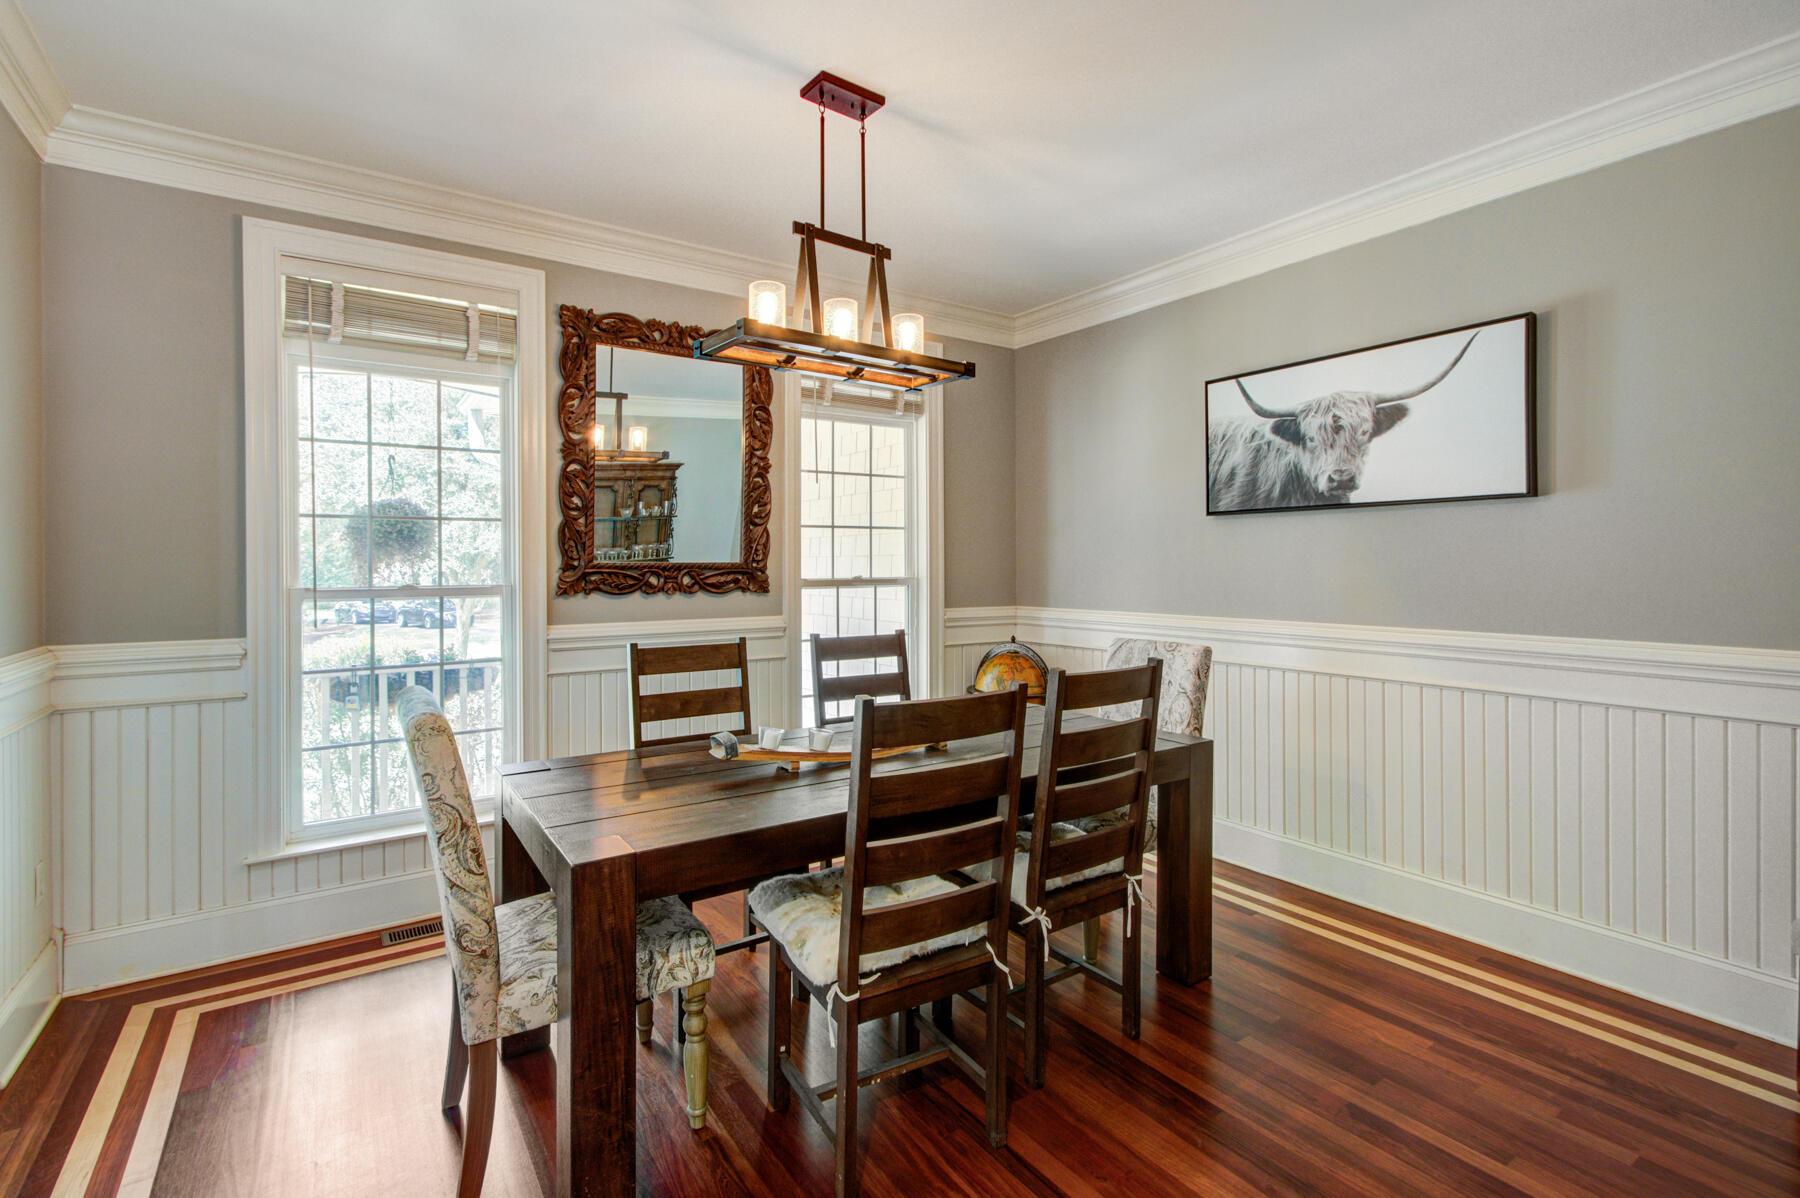 Dunes West Homes For Sale - 3095 Pignatelli, Mount Pleasant, SC - 27